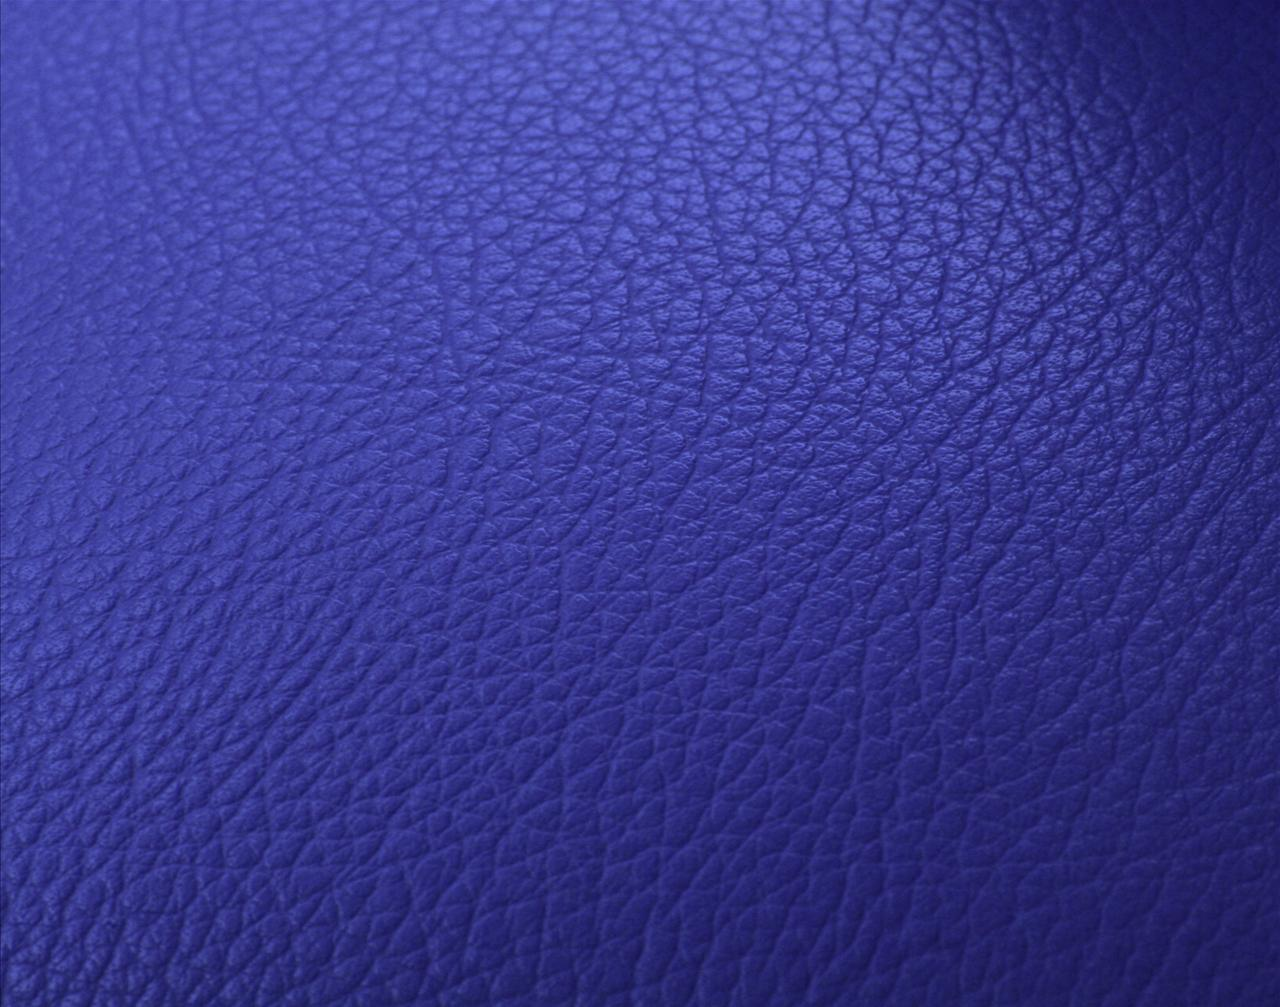 light blue leather background - photo #17